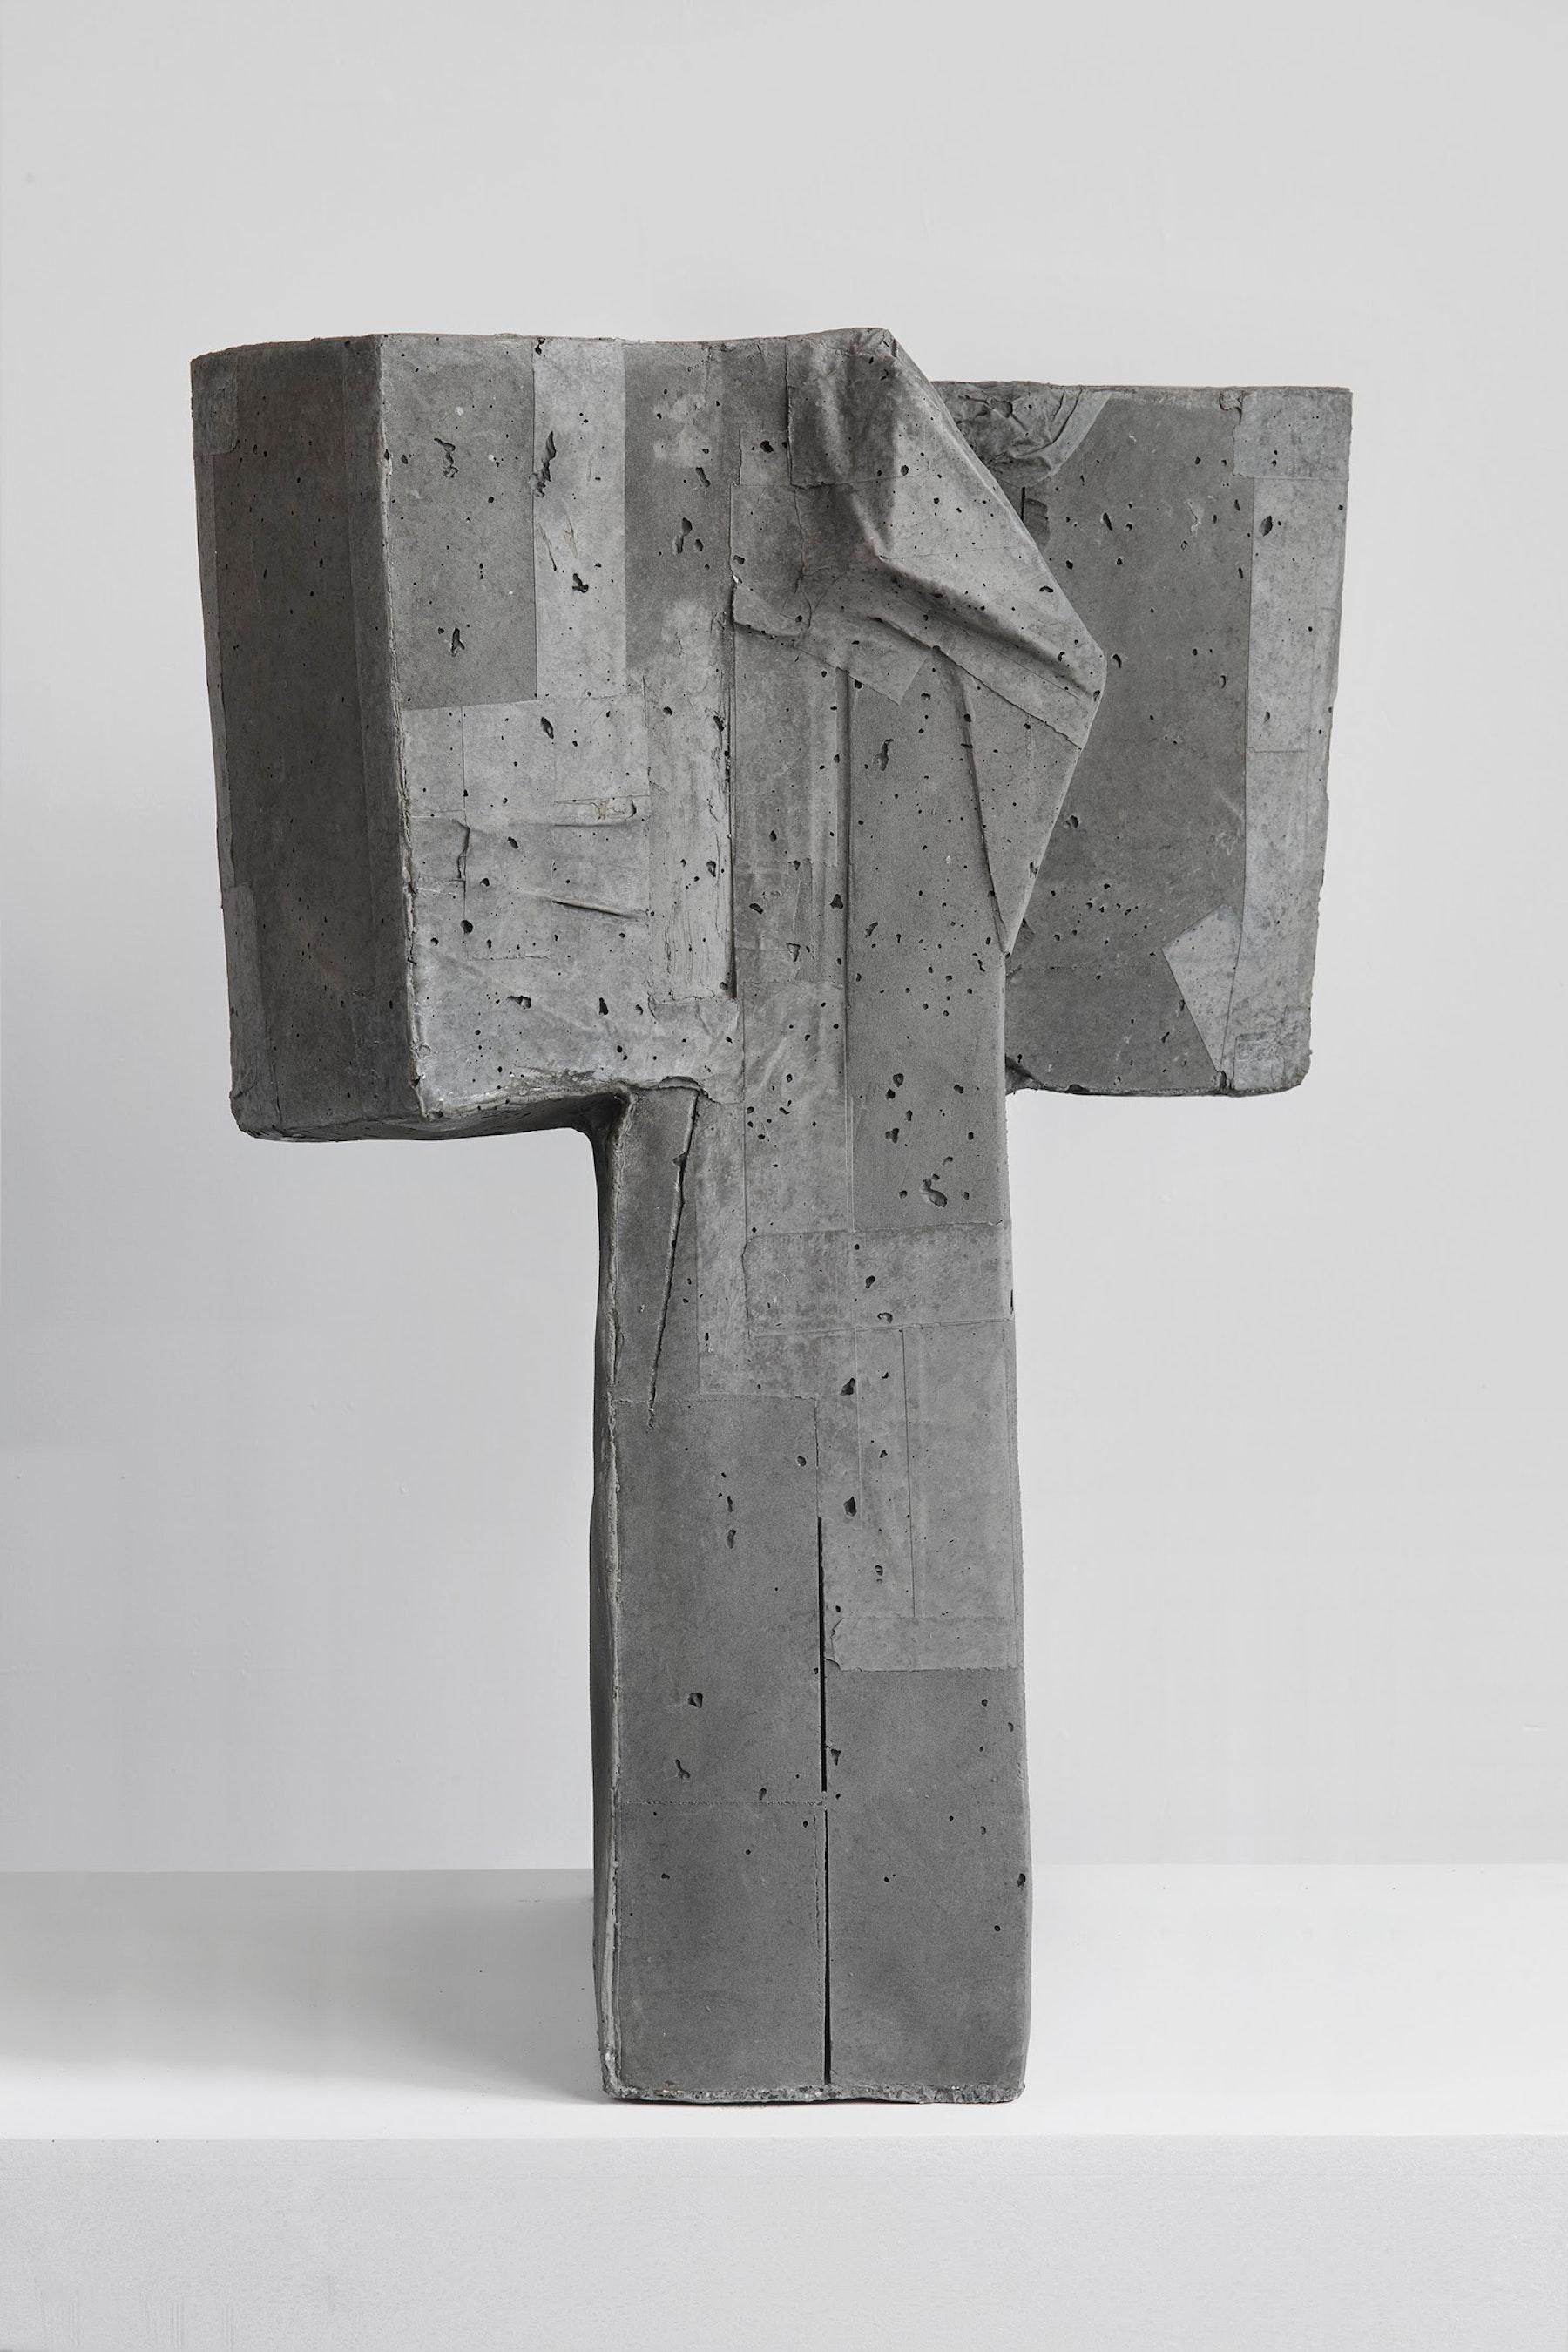 "Arlene Shechet ""Twins,"" 2019 Concrete 33.25 x 18 x 12.5"" [HxWxD] (84.45 x 45.72 x 31.75 cm) each sculpture Inventory #SHE146 Courtesy of the artist and Vielmetter Los Angeles. © Arlene Shechet Photo credit: Robert Wedemeyer"